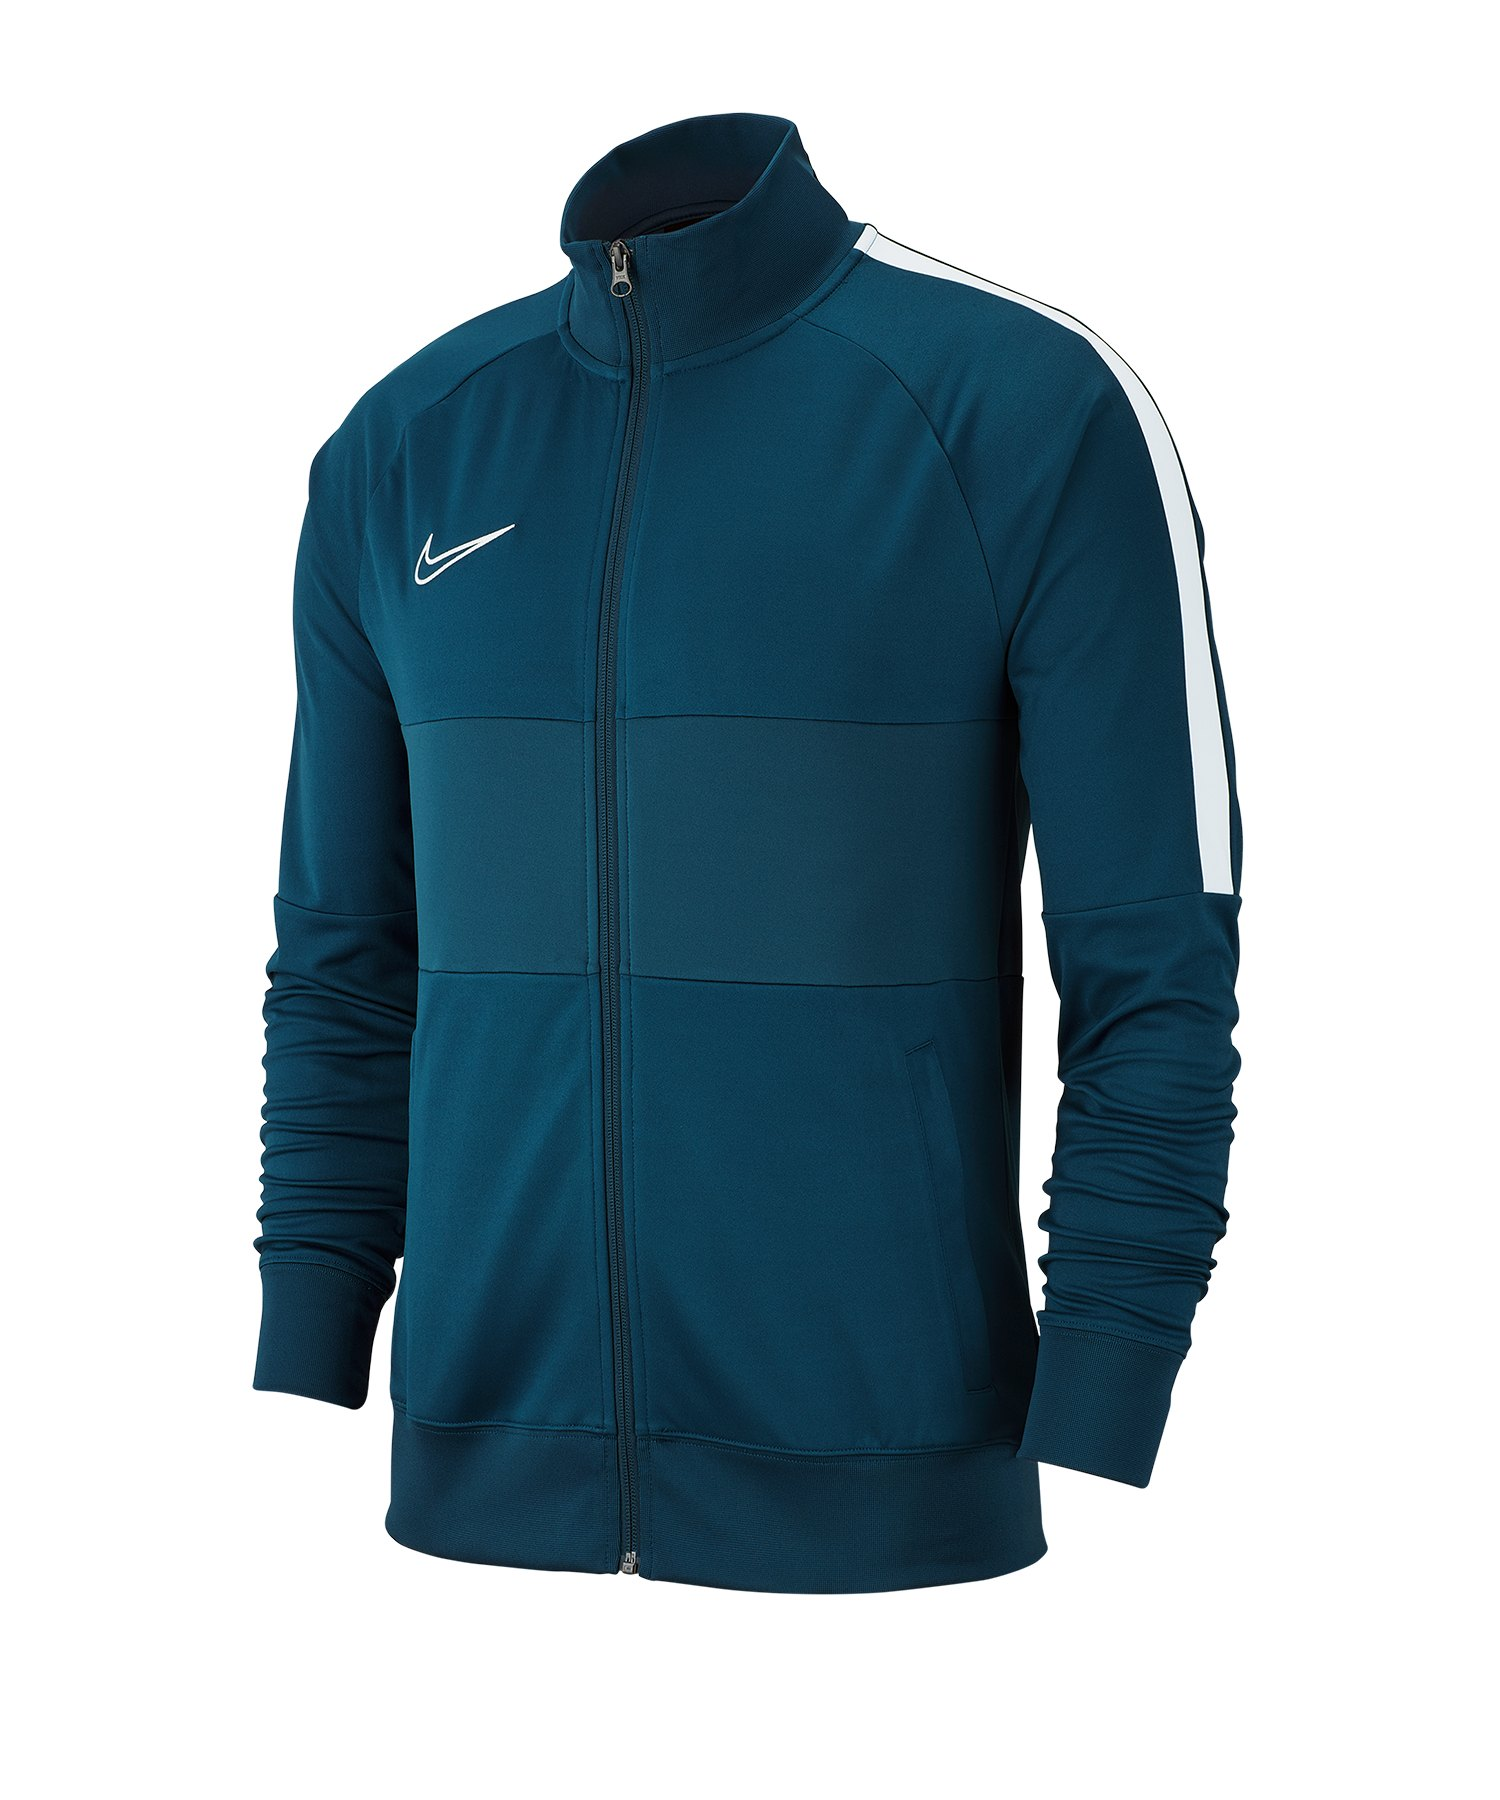 Nike Academy 19 Dri-FIT Jacke Kids Blau F404 - blau